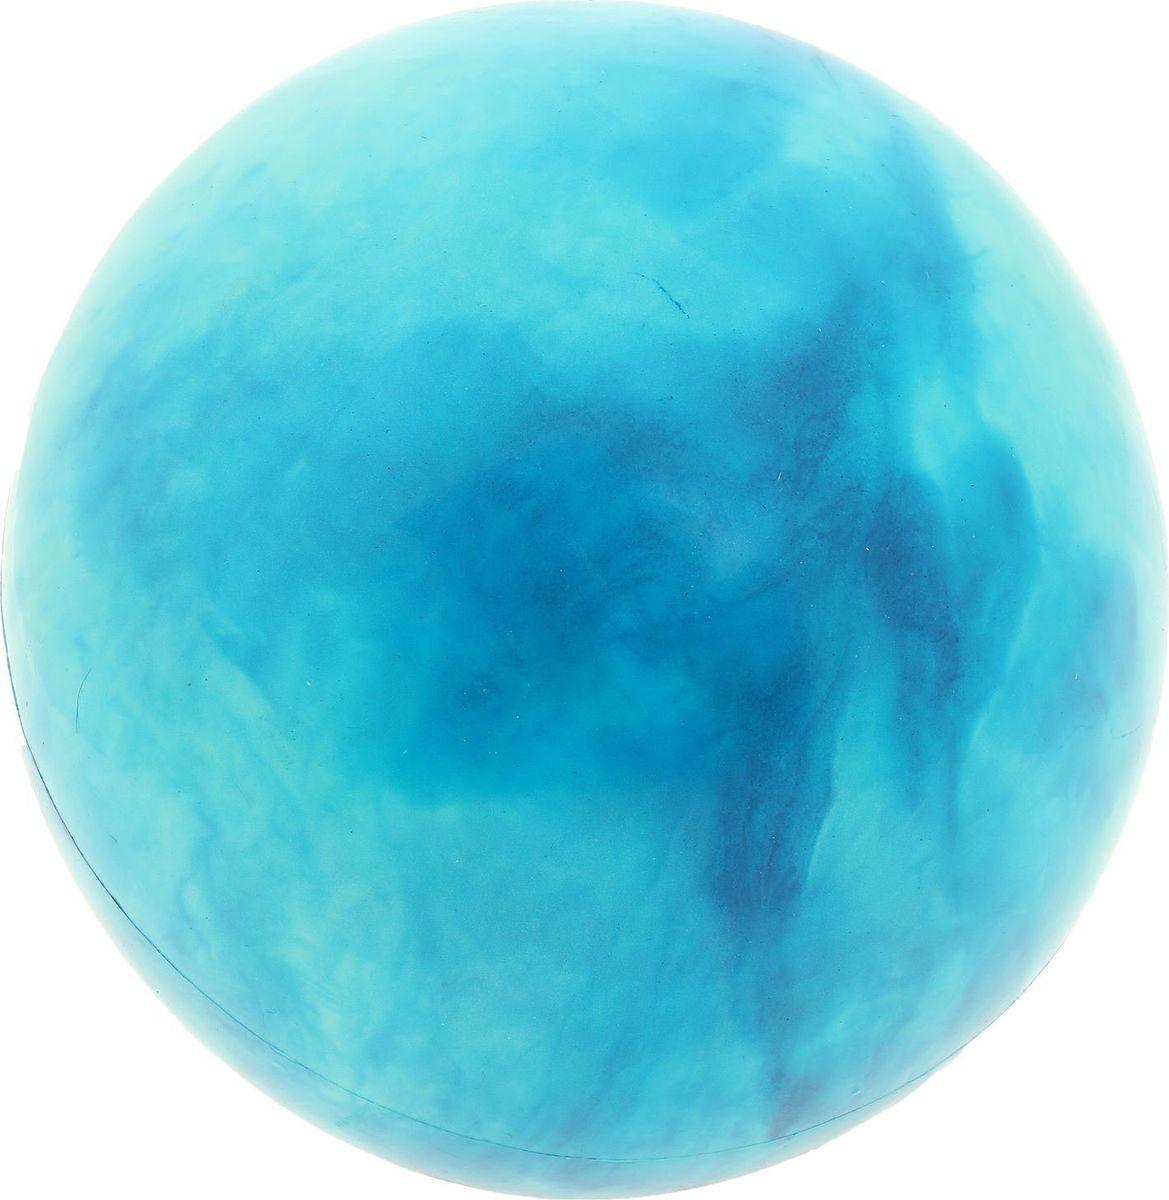 Забияка Мяч Слияние цвета цвет голубой 20 см